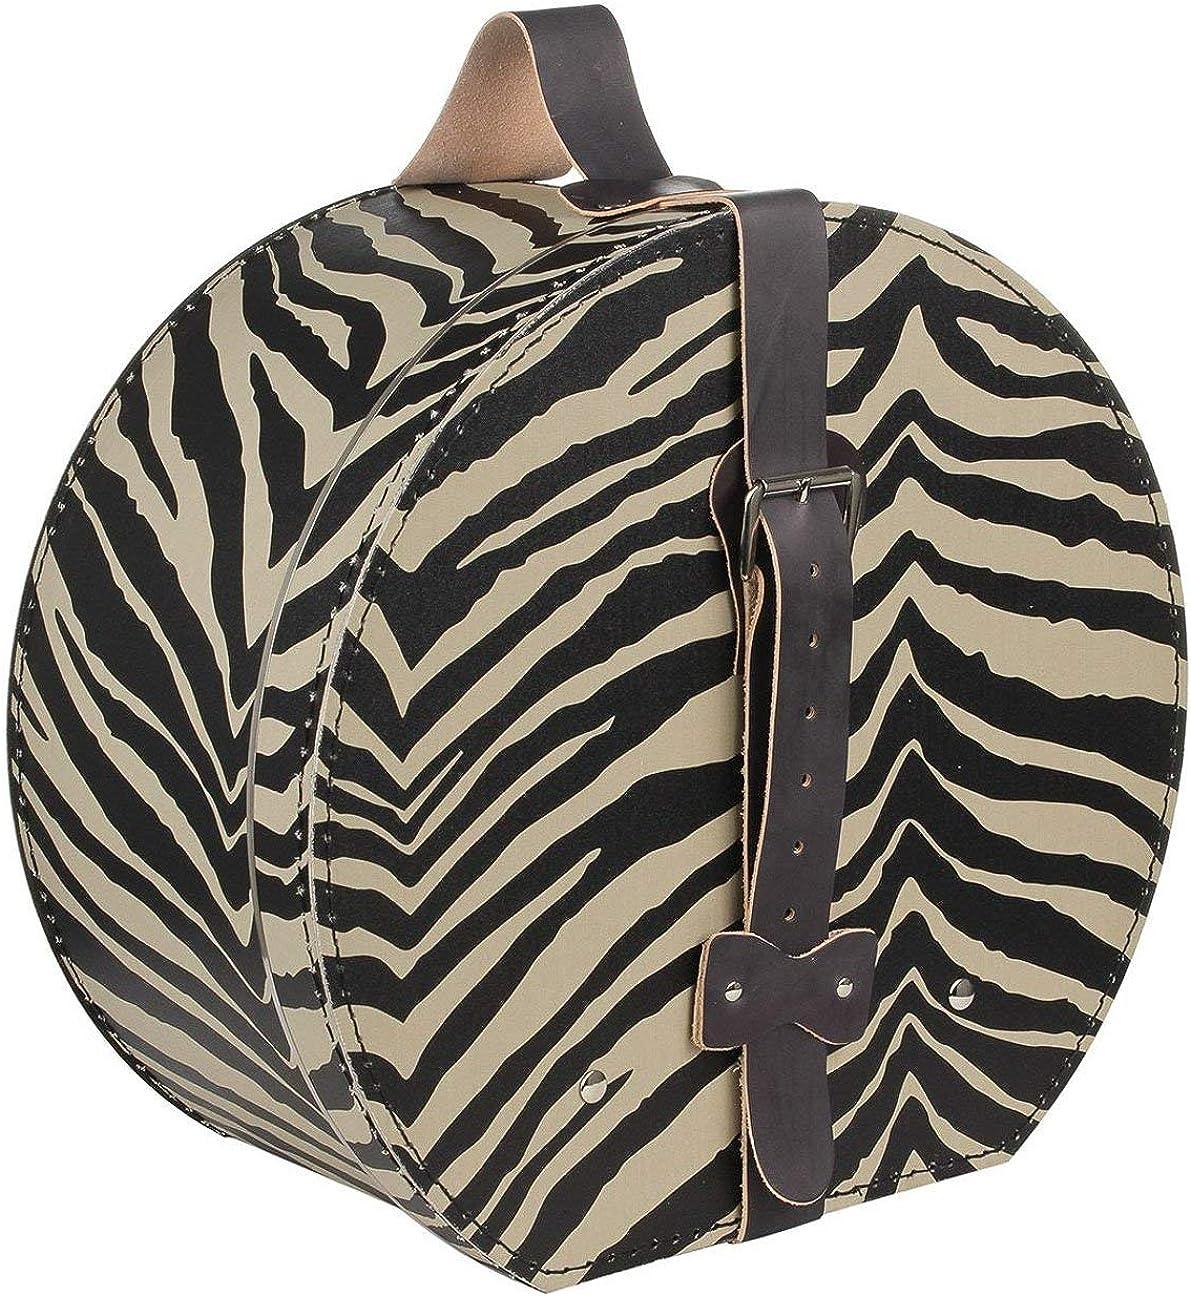 Lierys Caja para Sombrero Cebra Mujer - Verano/Invierno